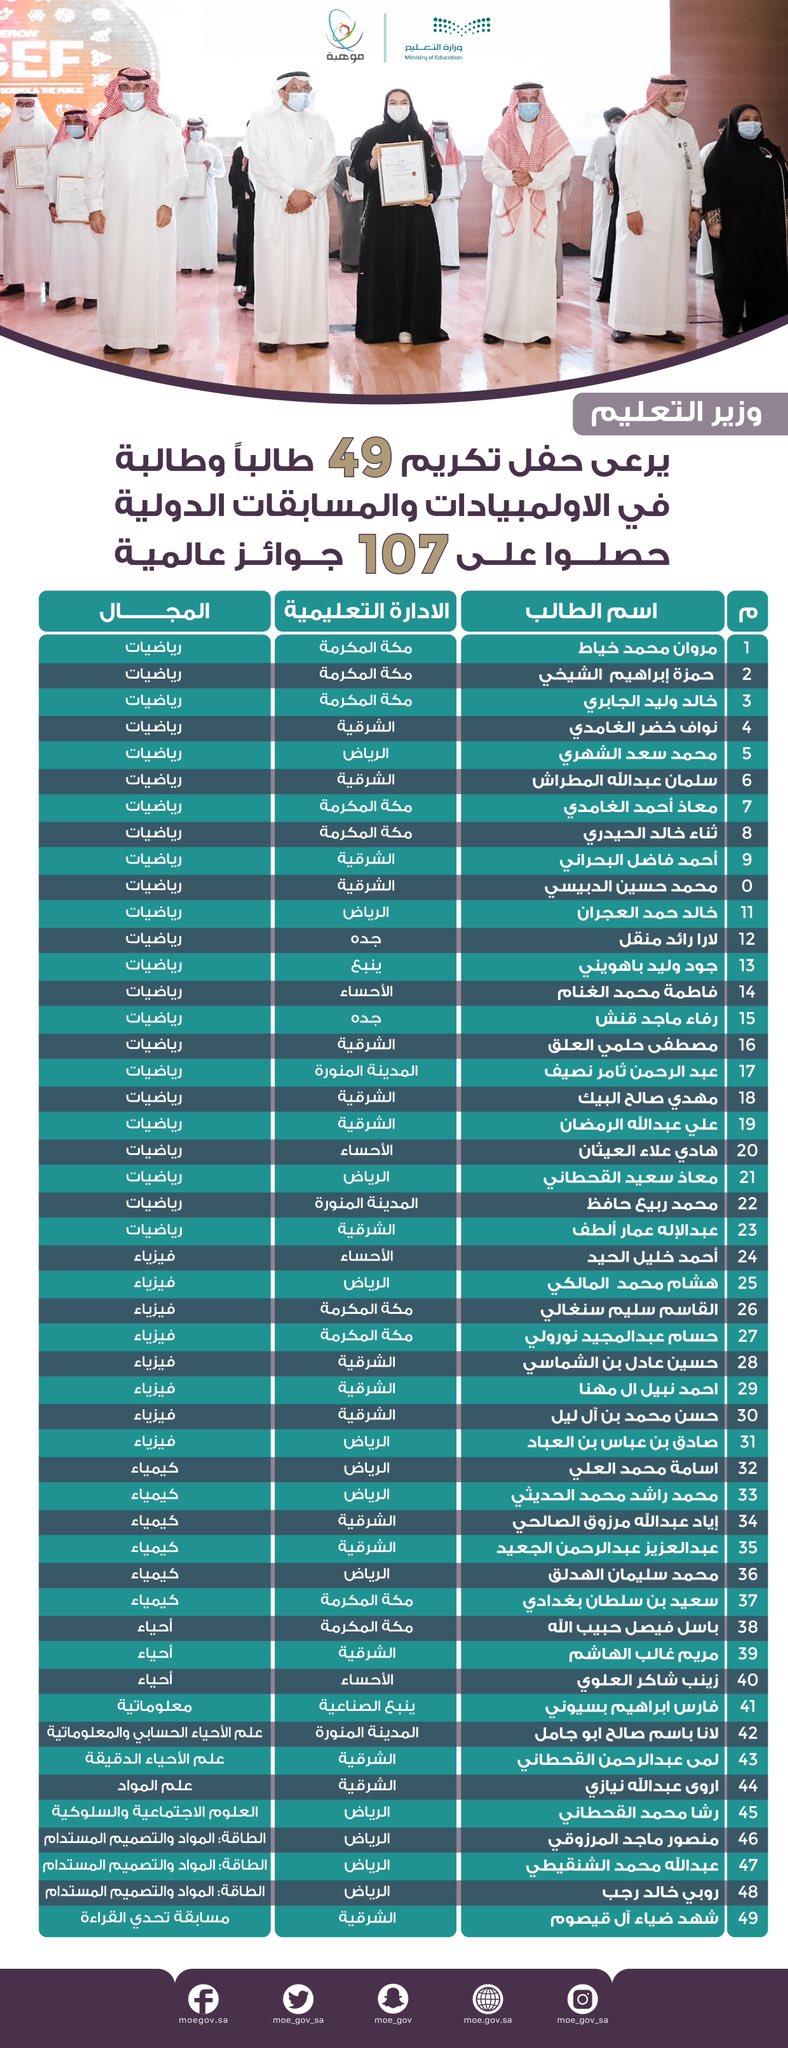 FBFmDdAXoAMsFg9 - وزير التعليم يكريم 49 طالباً وطالبة حصلوا على جوائز عالمية .. التفاصيل هنا !!